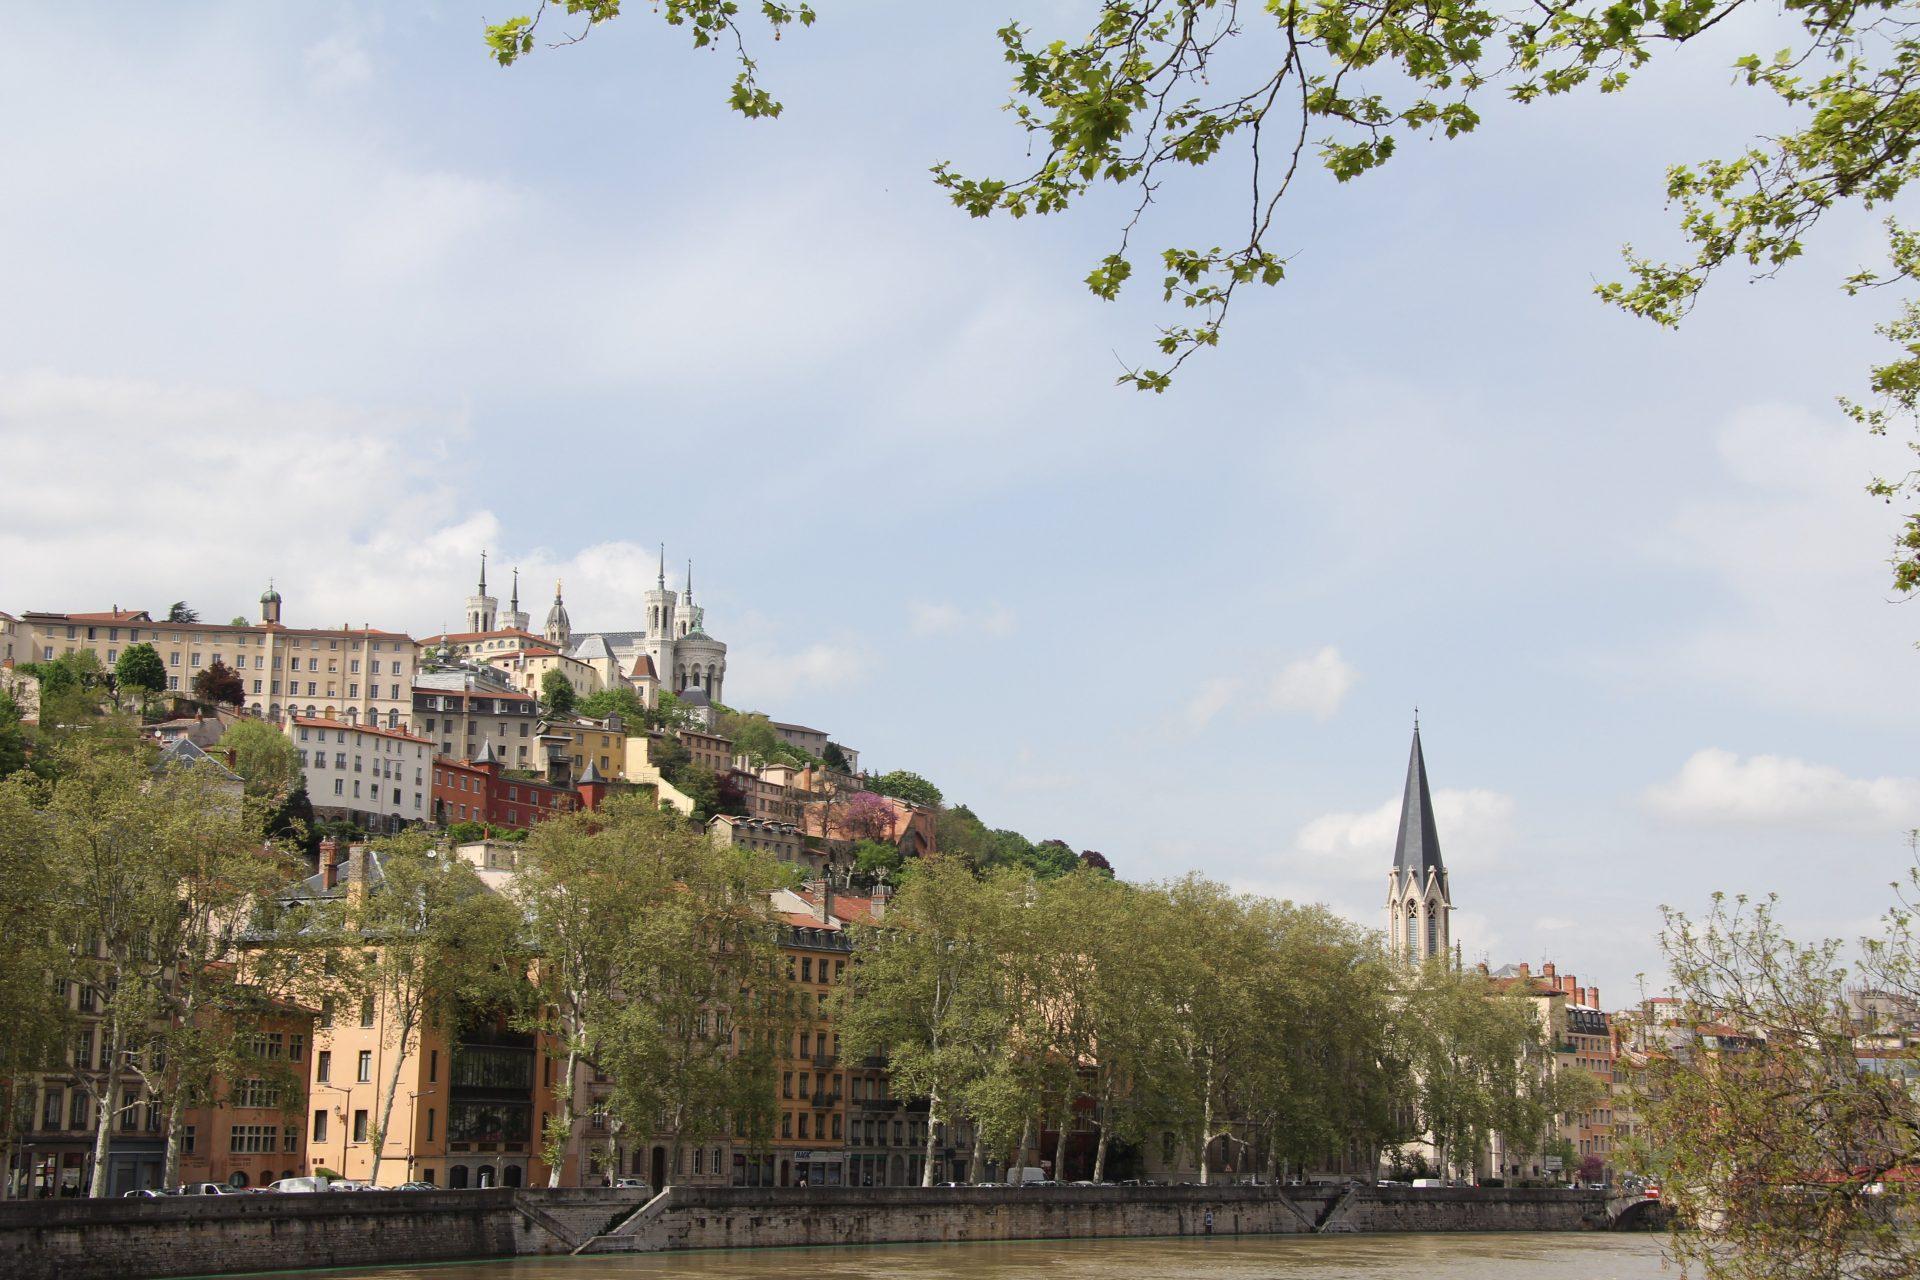 Вид на Базилика Нотр-Дам-де-Фурвьер с набережной реки Сона. Лион, Франция. Май, 2013